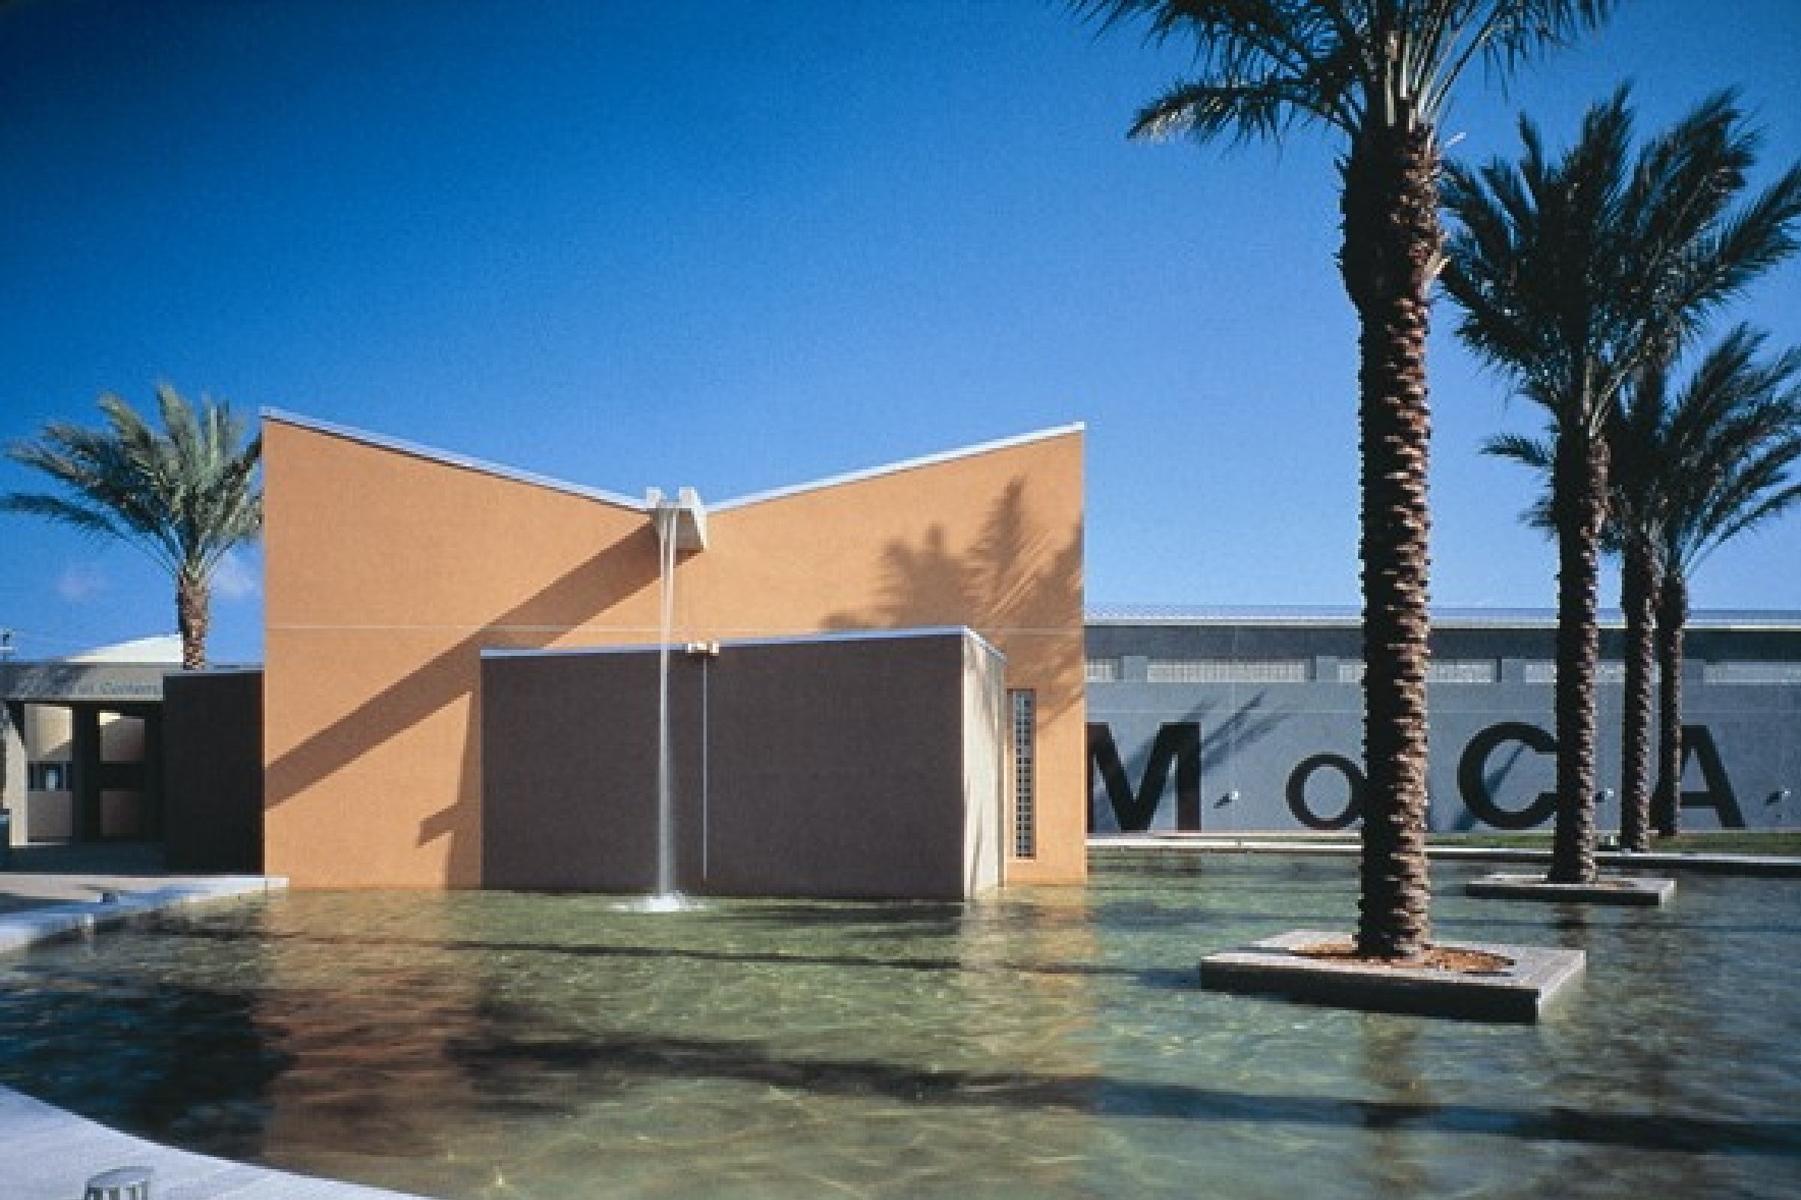 MOCA Appoints Curator Alex Gartenfeld as Interim Director and Chief Curator